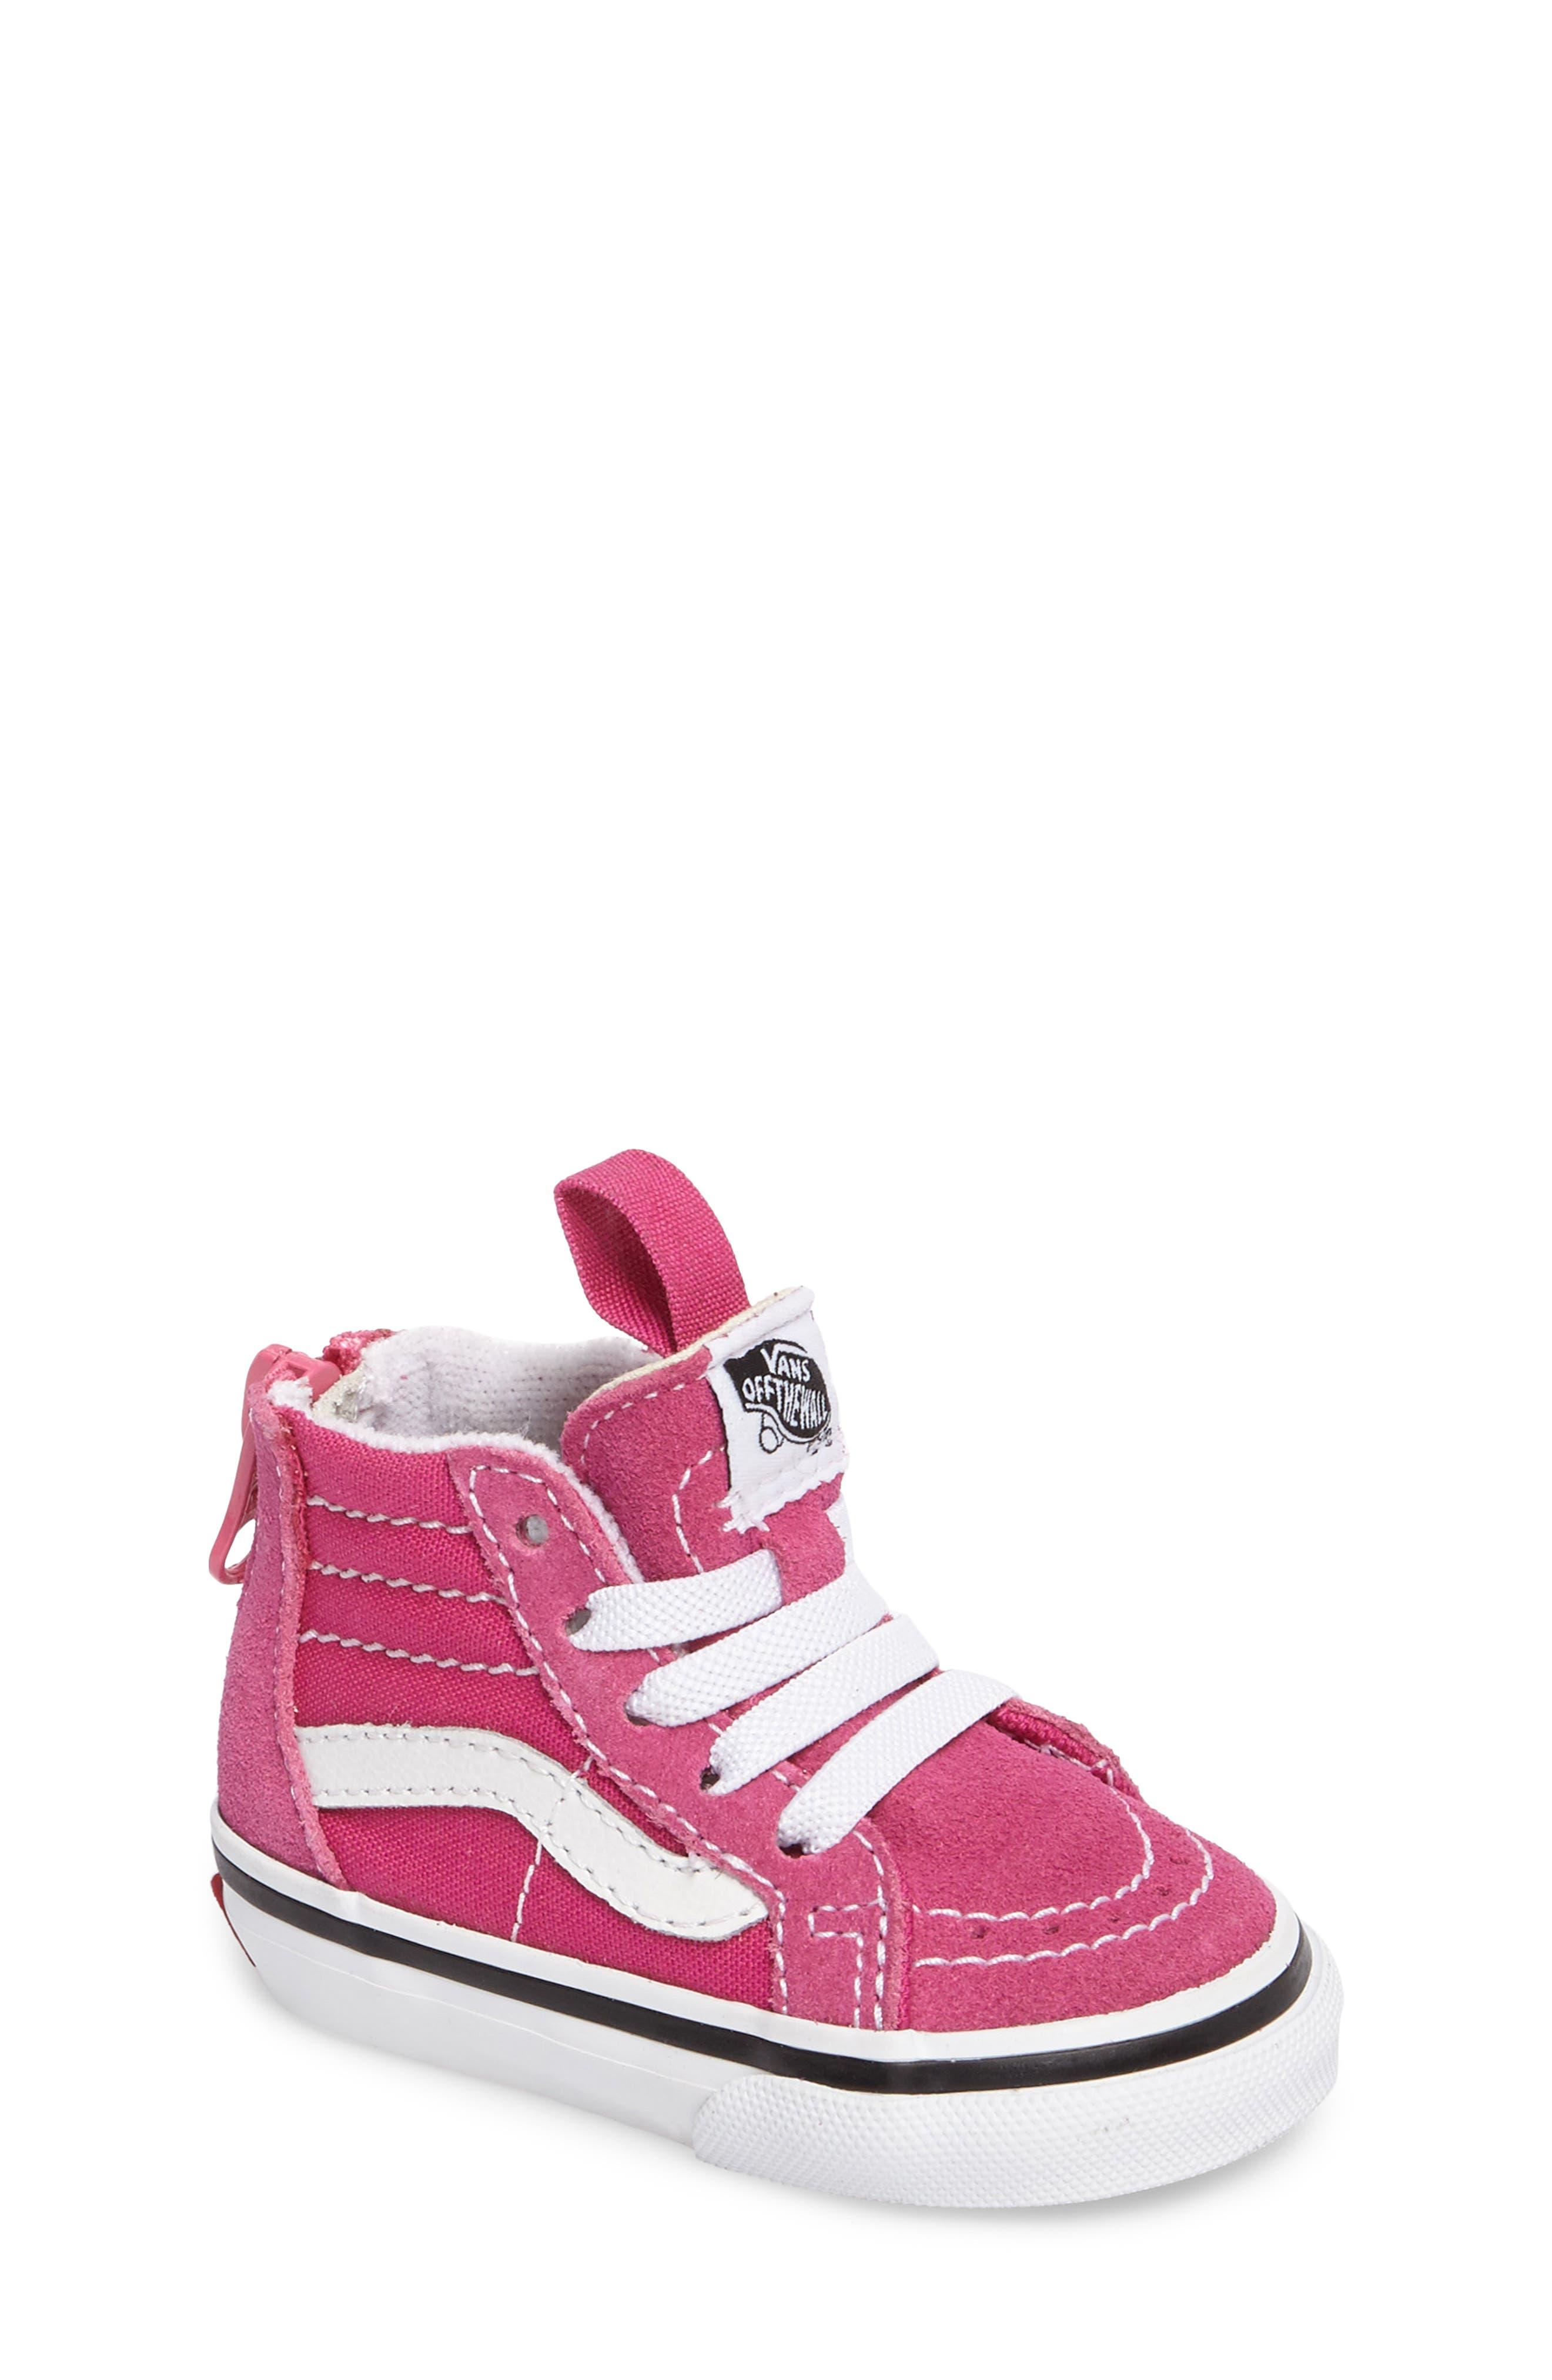 Alternate Image 1 Selected - Vans Sk8-Hi Zip Sneaker (Baby, Walker, Toddler, Little Kid & Big Kid)